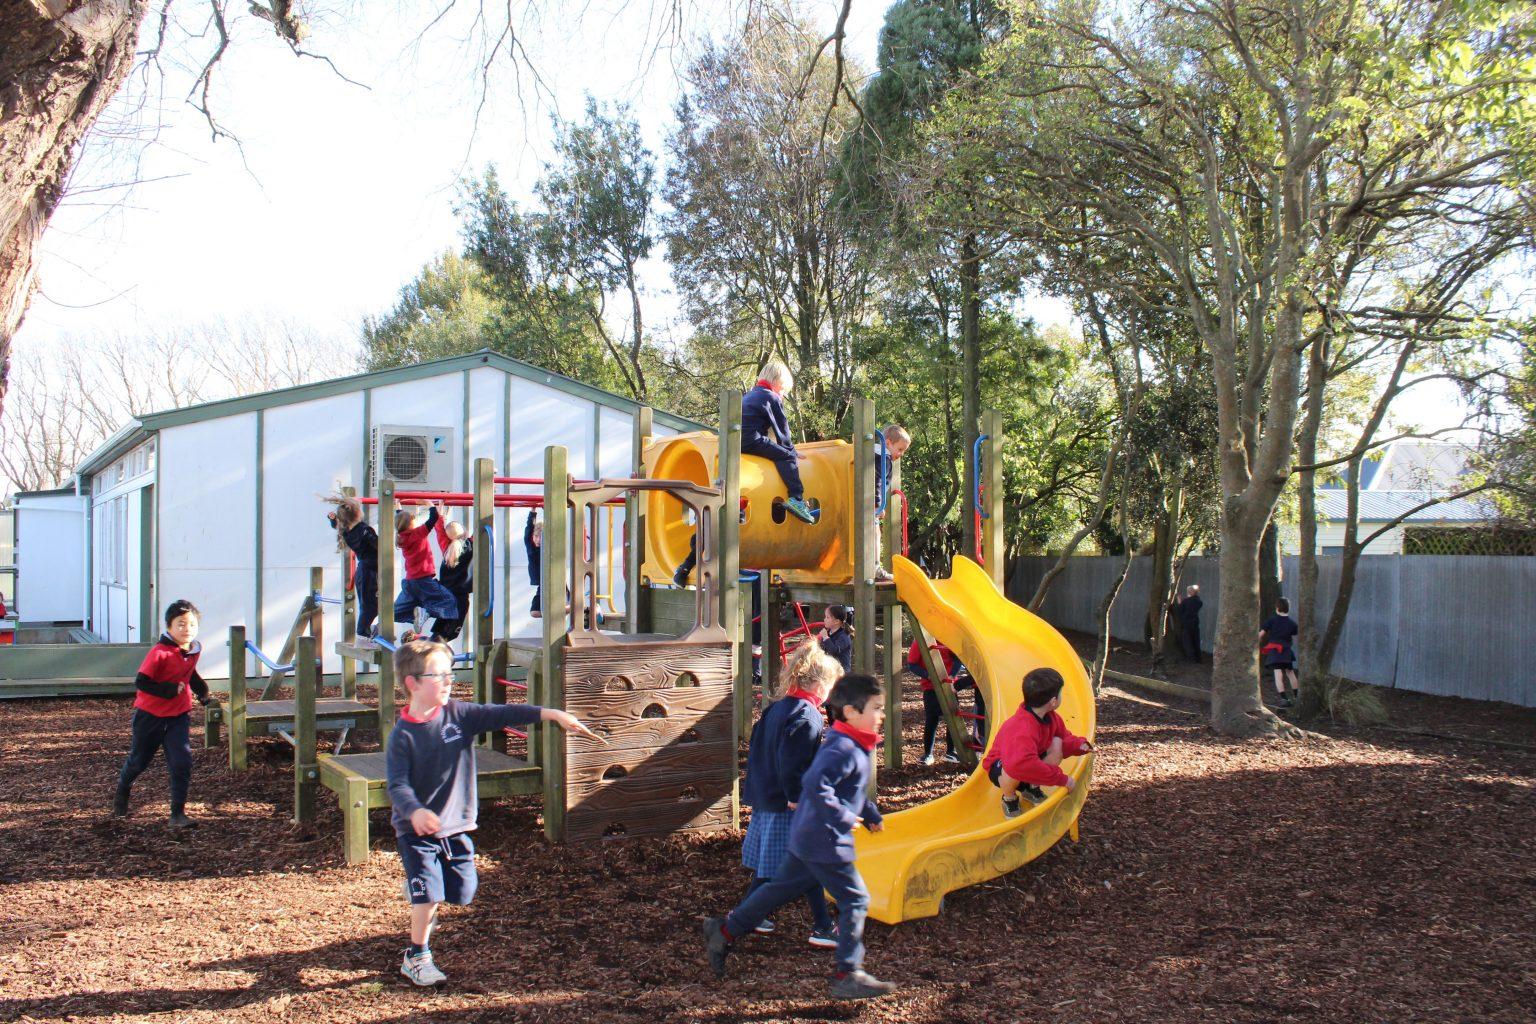 Somerfield Te Kura Wairepo students on small outdoor playground